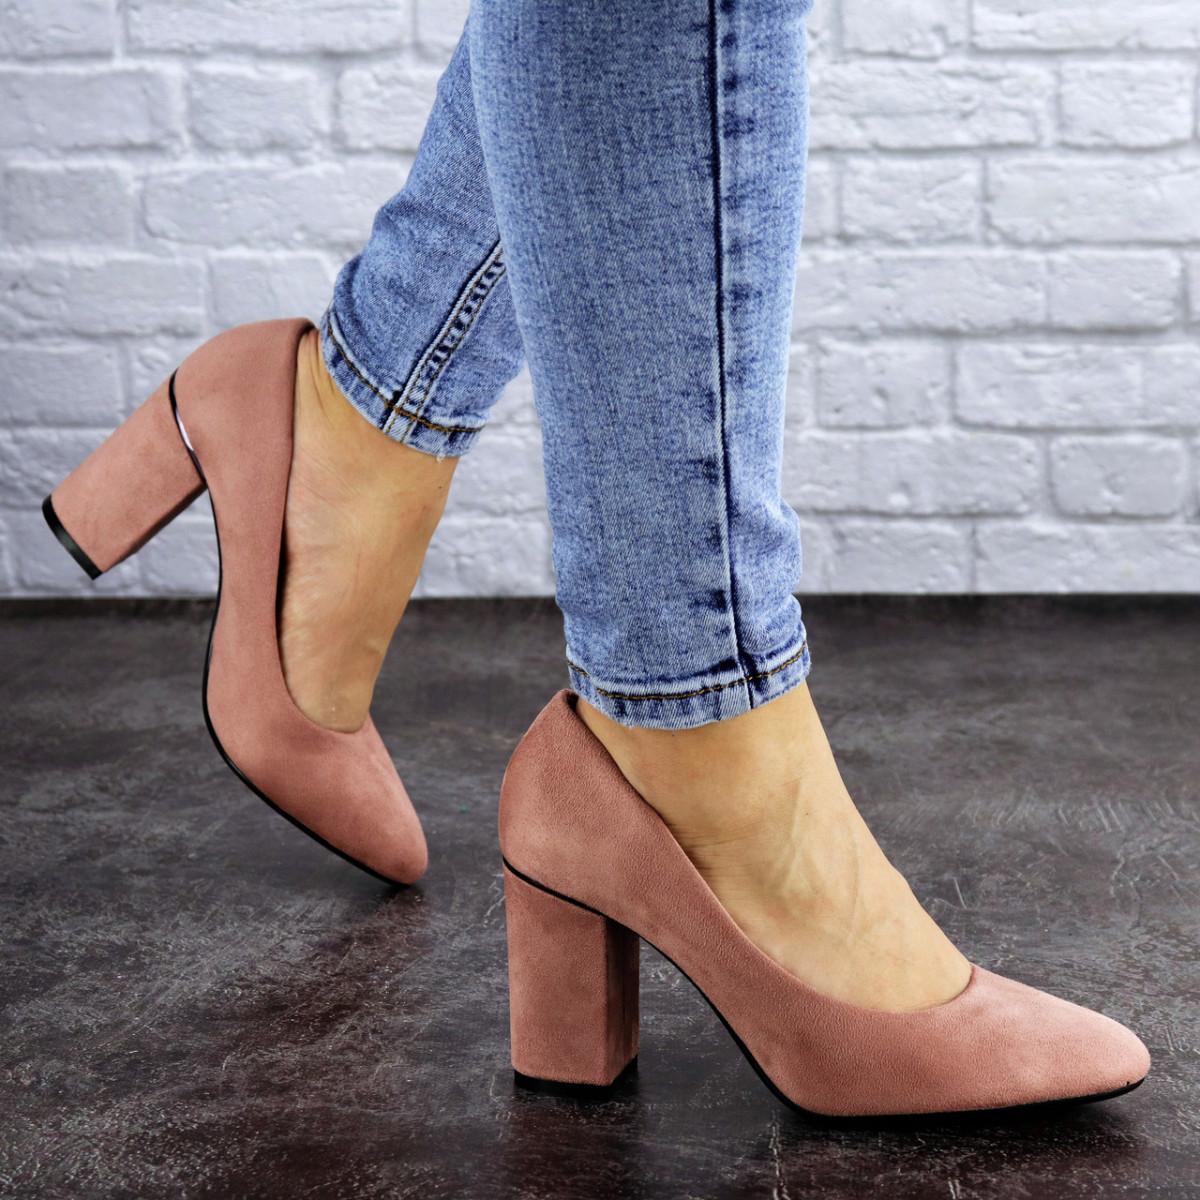 Туфли женские на каблуке розовые Beans 2131 (36 размер)